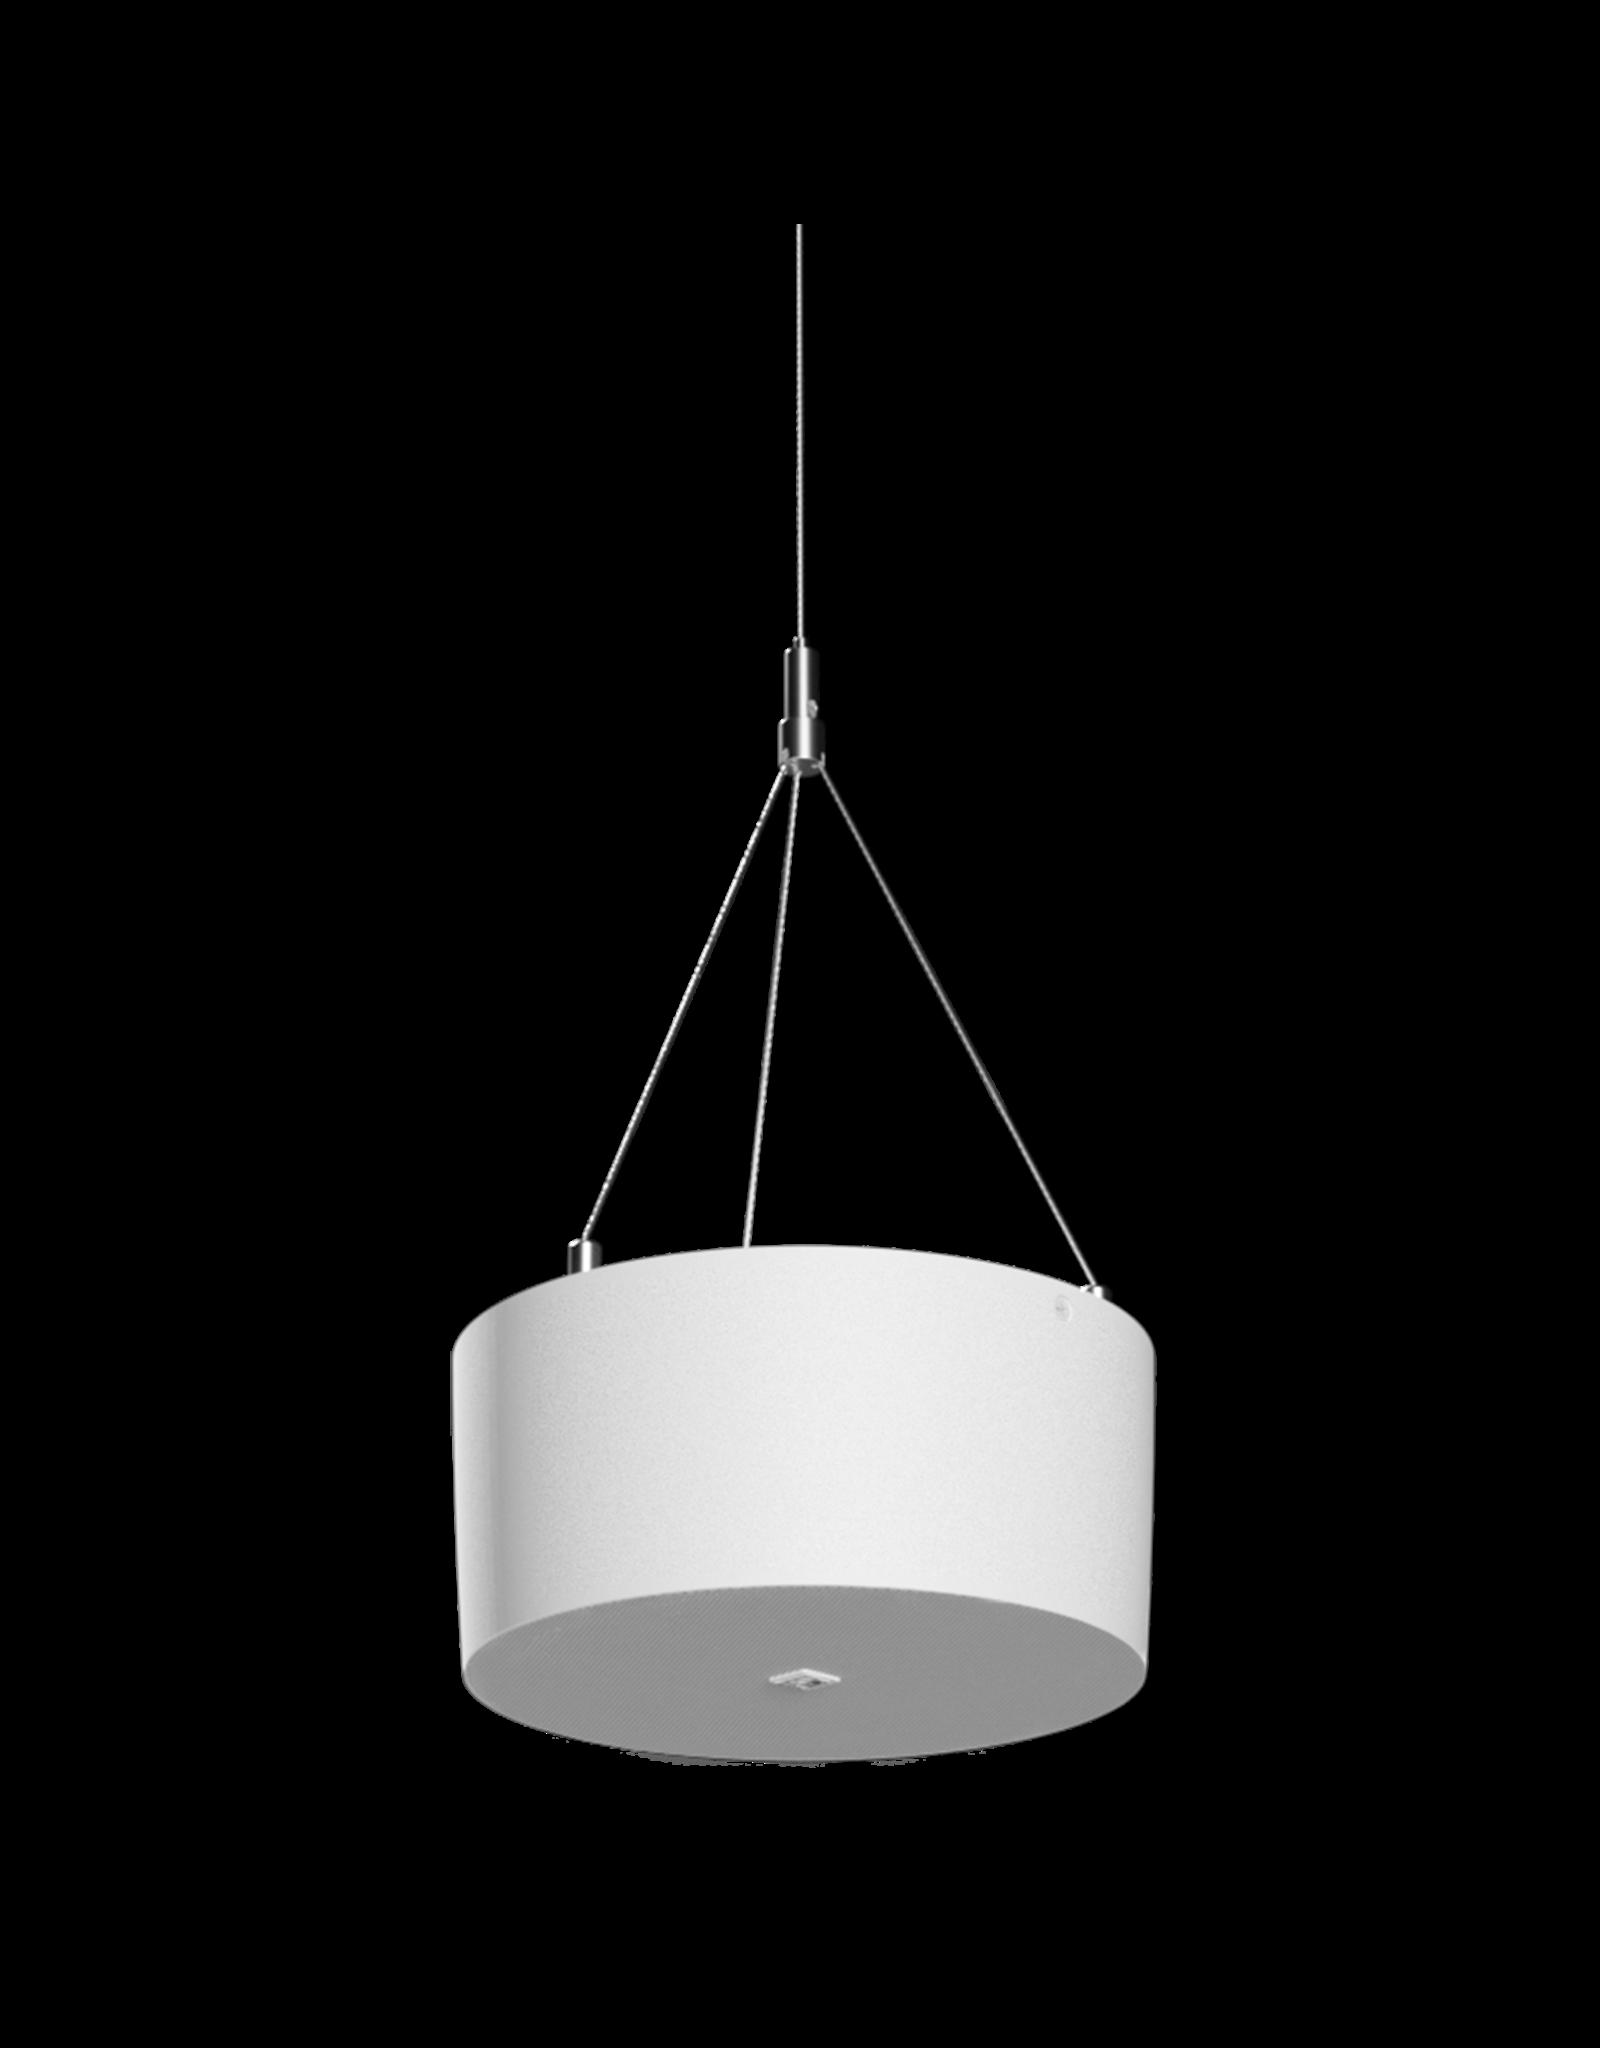 Audac Pendant ceiling suspension kit for NELO series